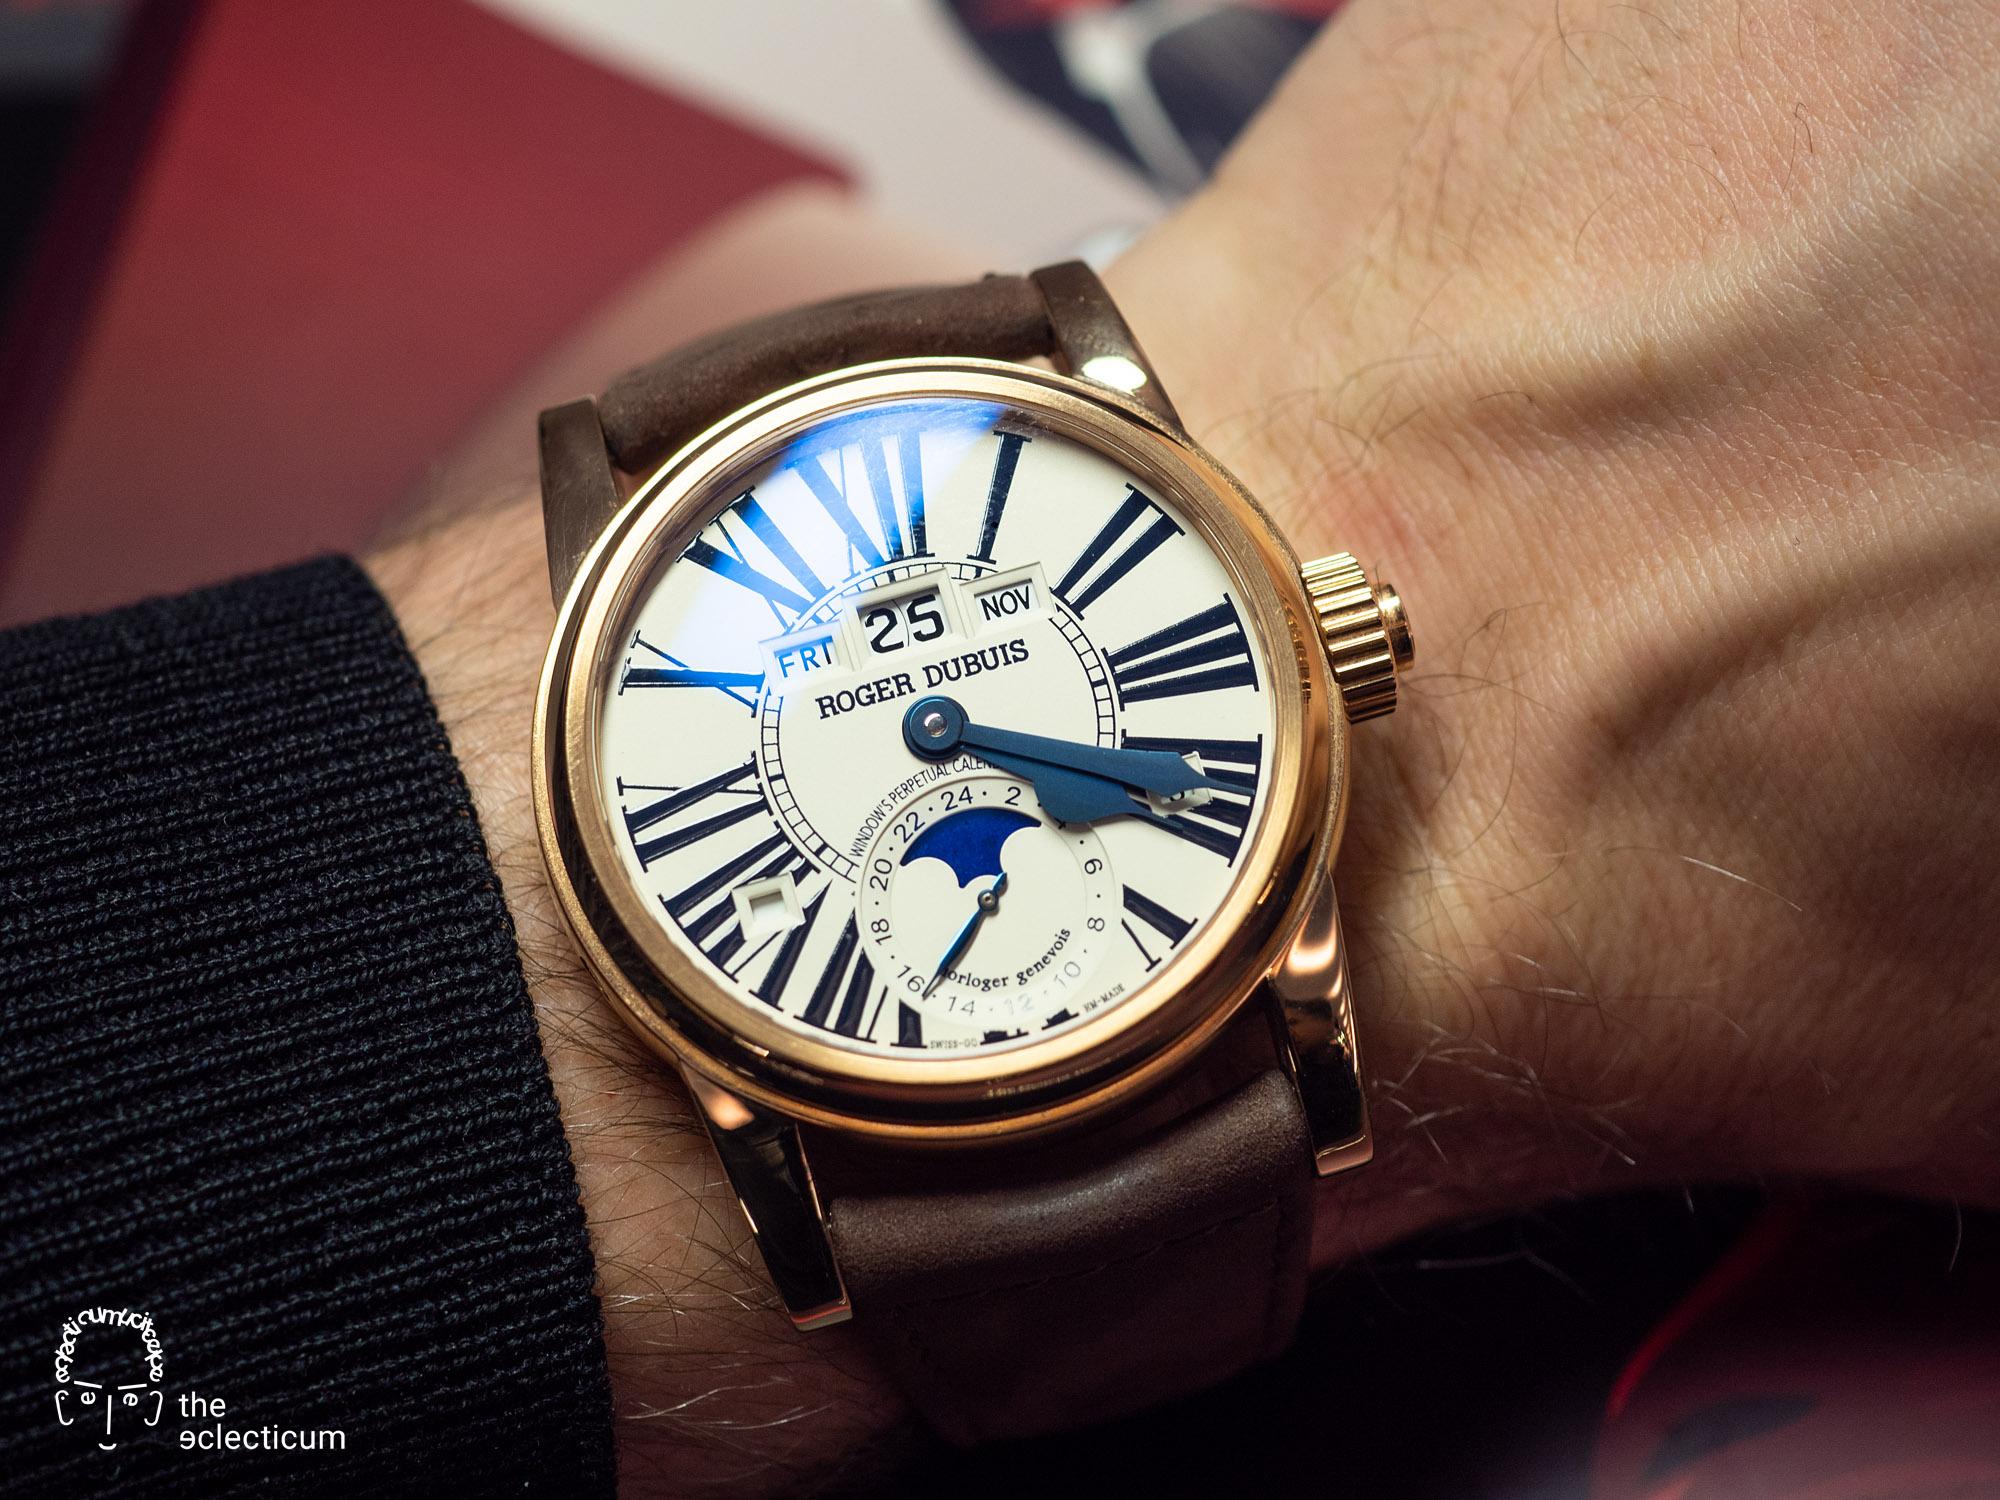 Roger Dubuis Hommage Perpetual Calendar Dual Time Poinçon de Geneve Geneva Seal wristshot